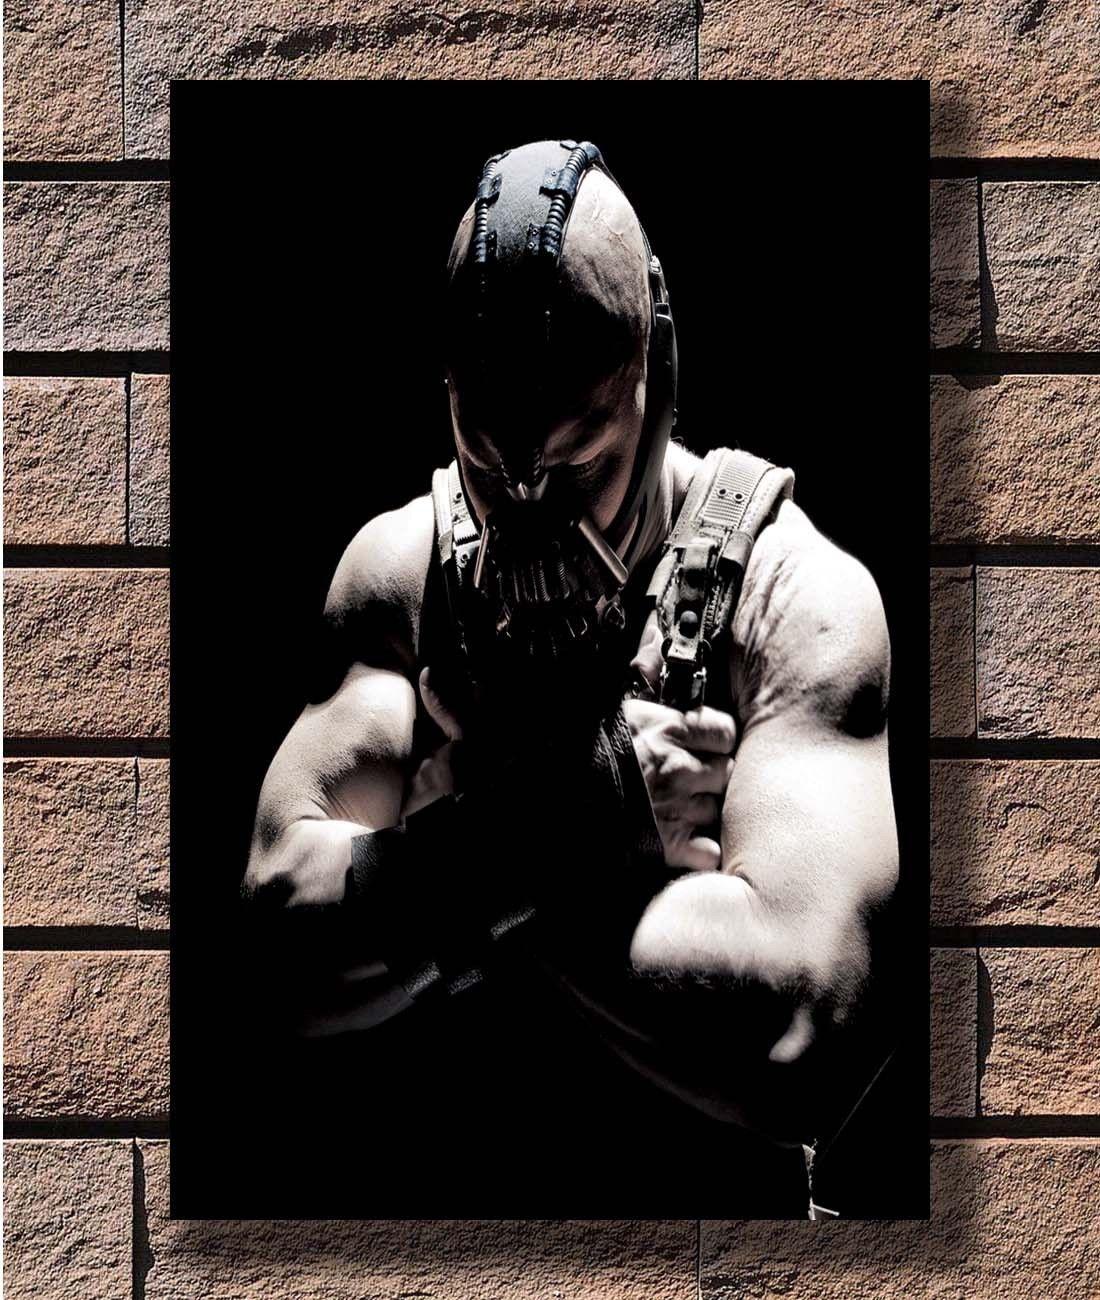 Q0685 Posters and Prints Bane Batman The Dark Knight Rises 8x12 20x30 24x36 Art Poster Canvas Painting Home Decor